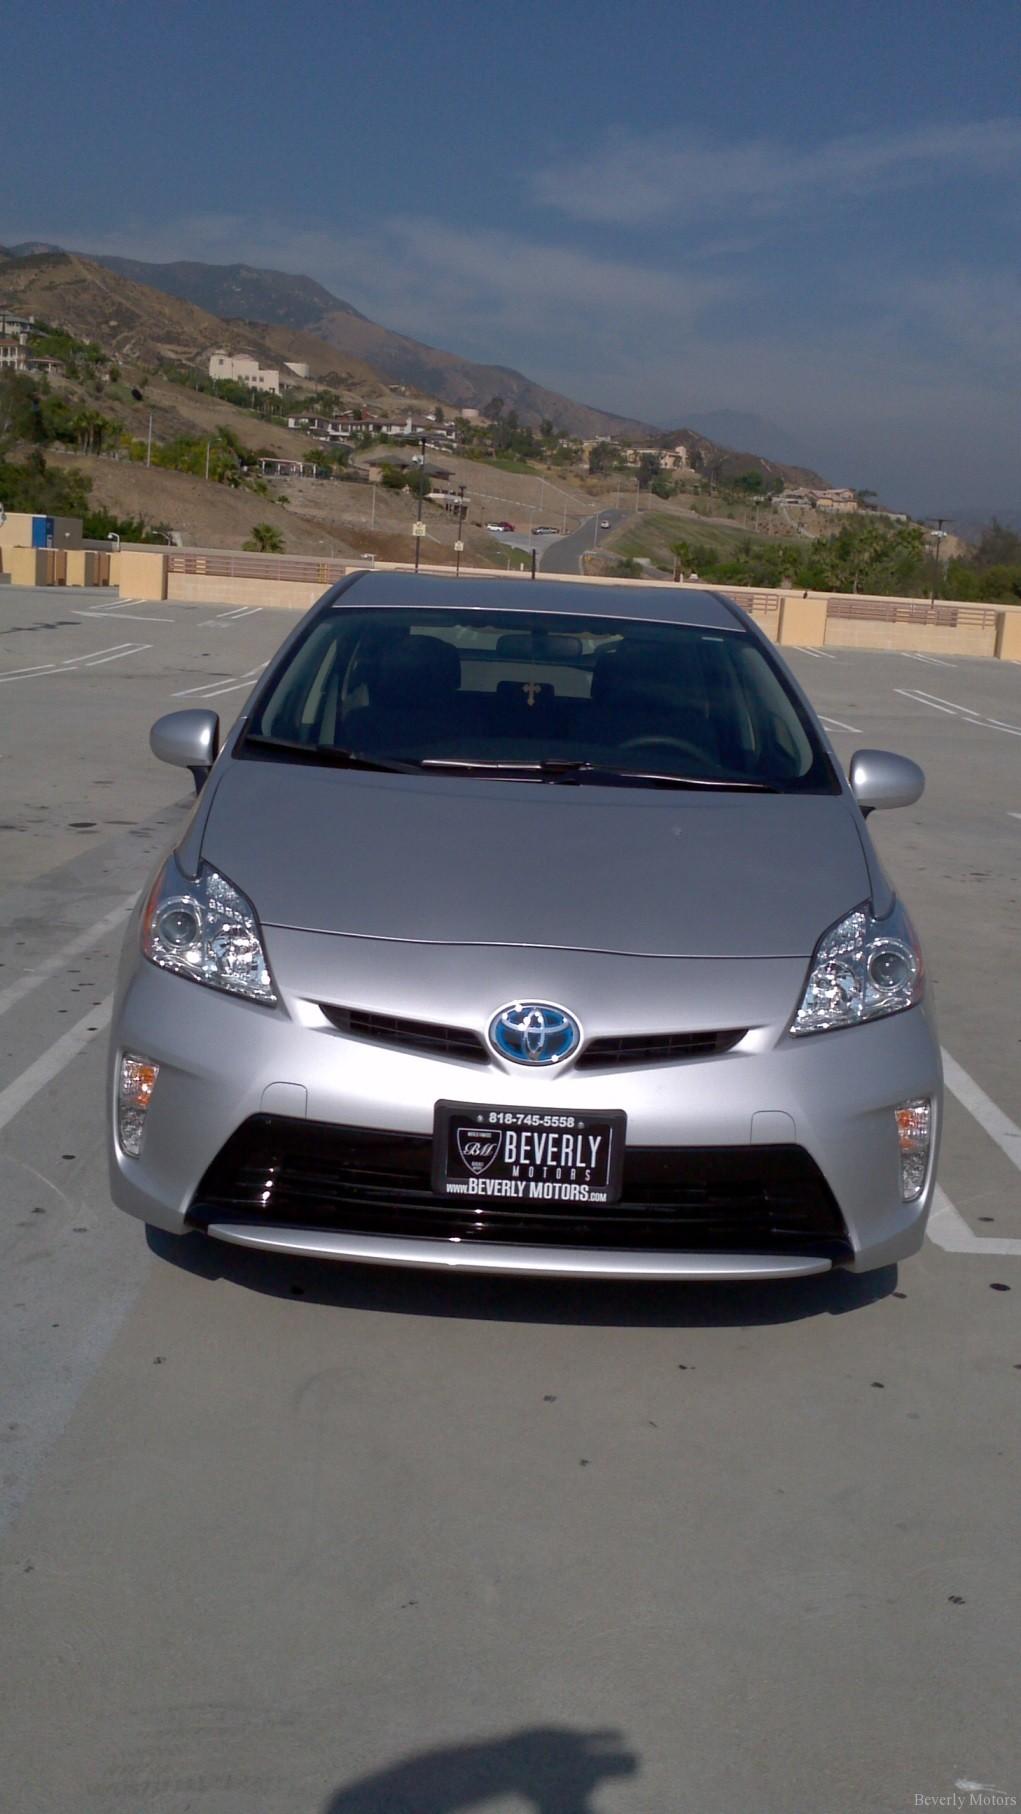 Prius Lease Deals Glendale Lamoureph Blog